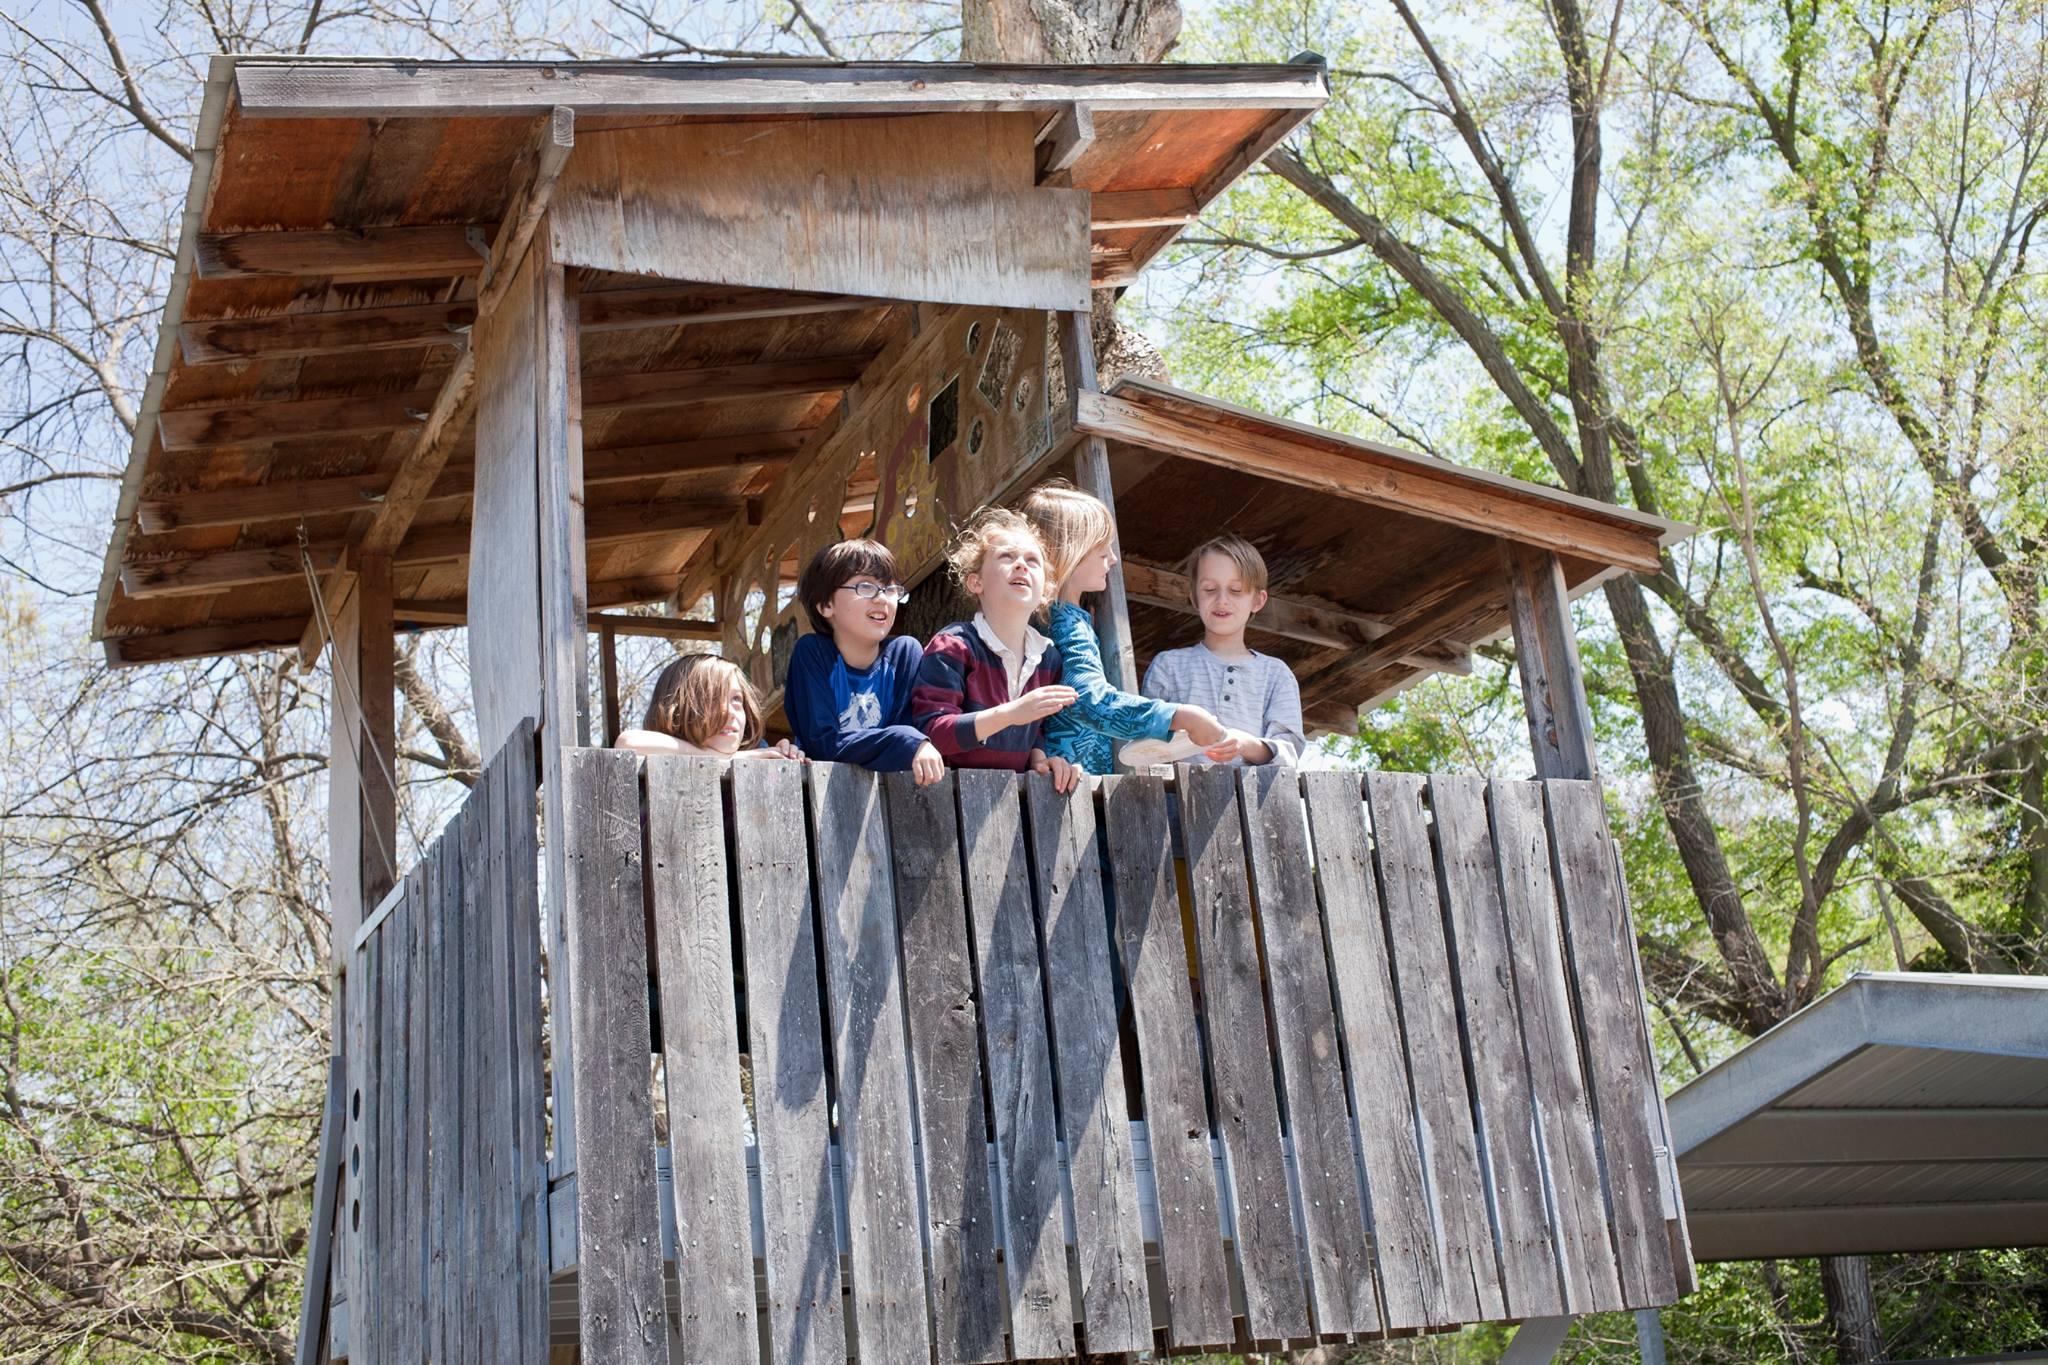 Neighborhood kids in the tree house